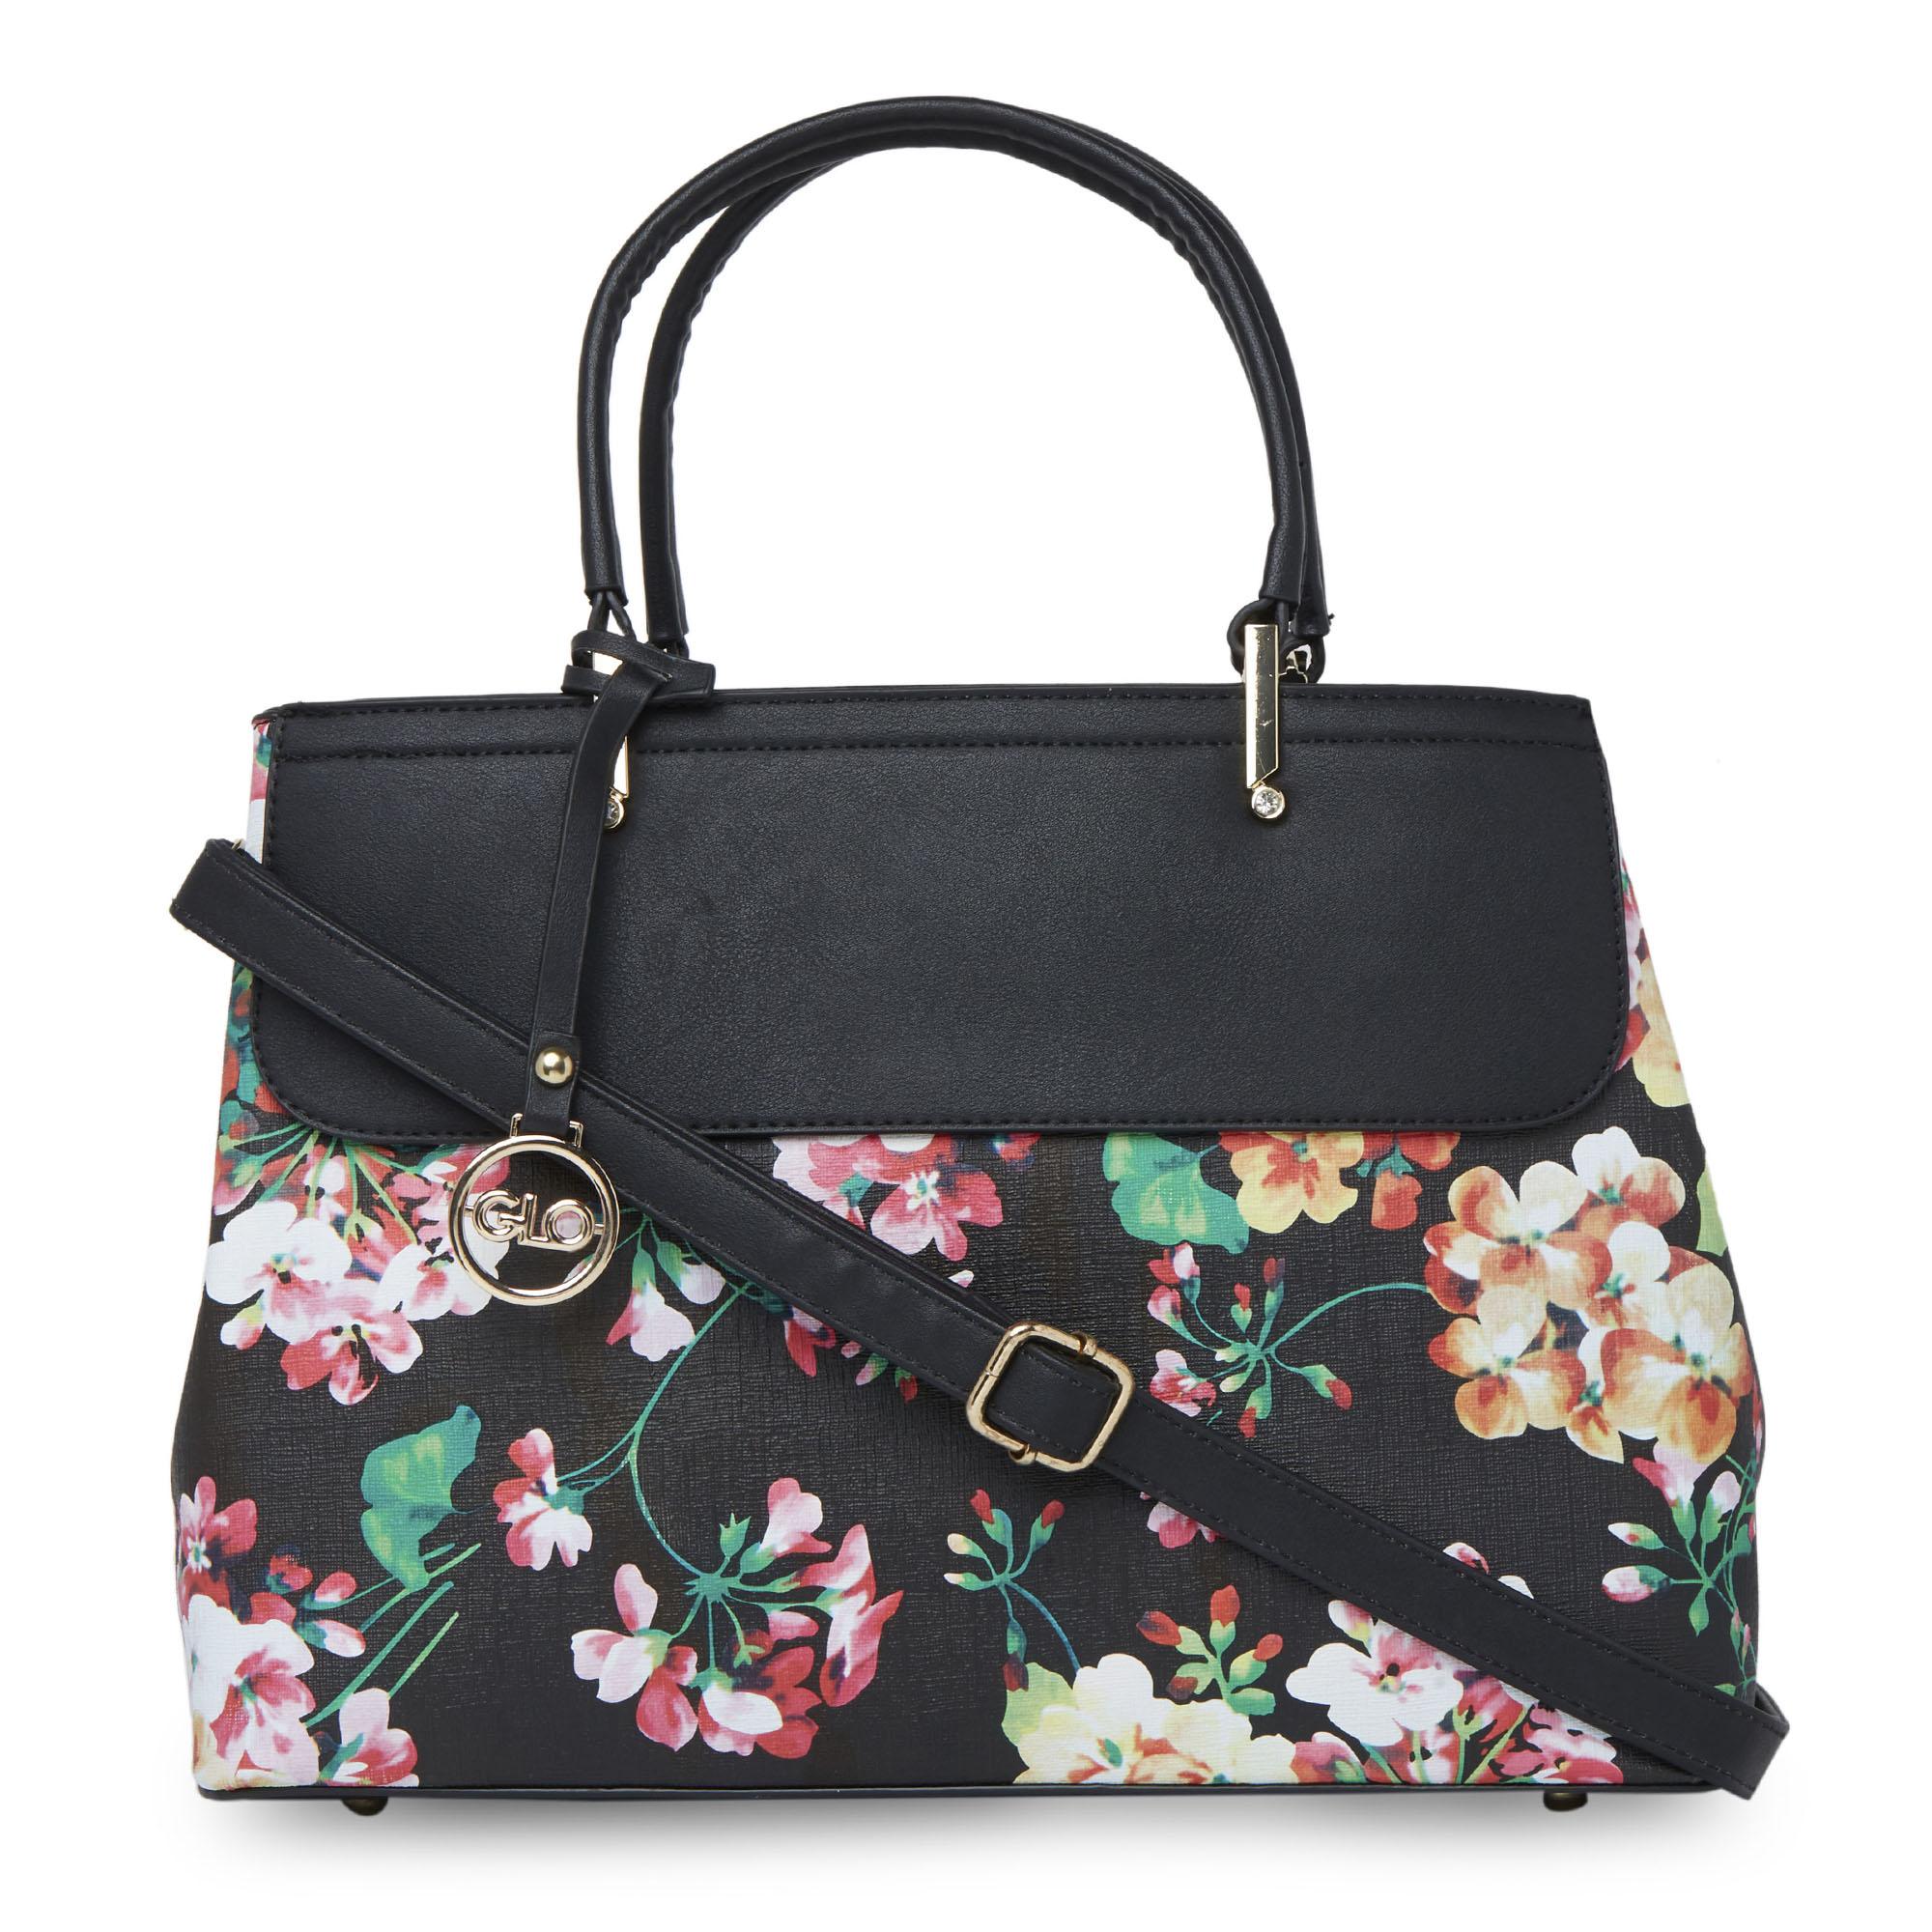 globus | Globus Black Hand Bag